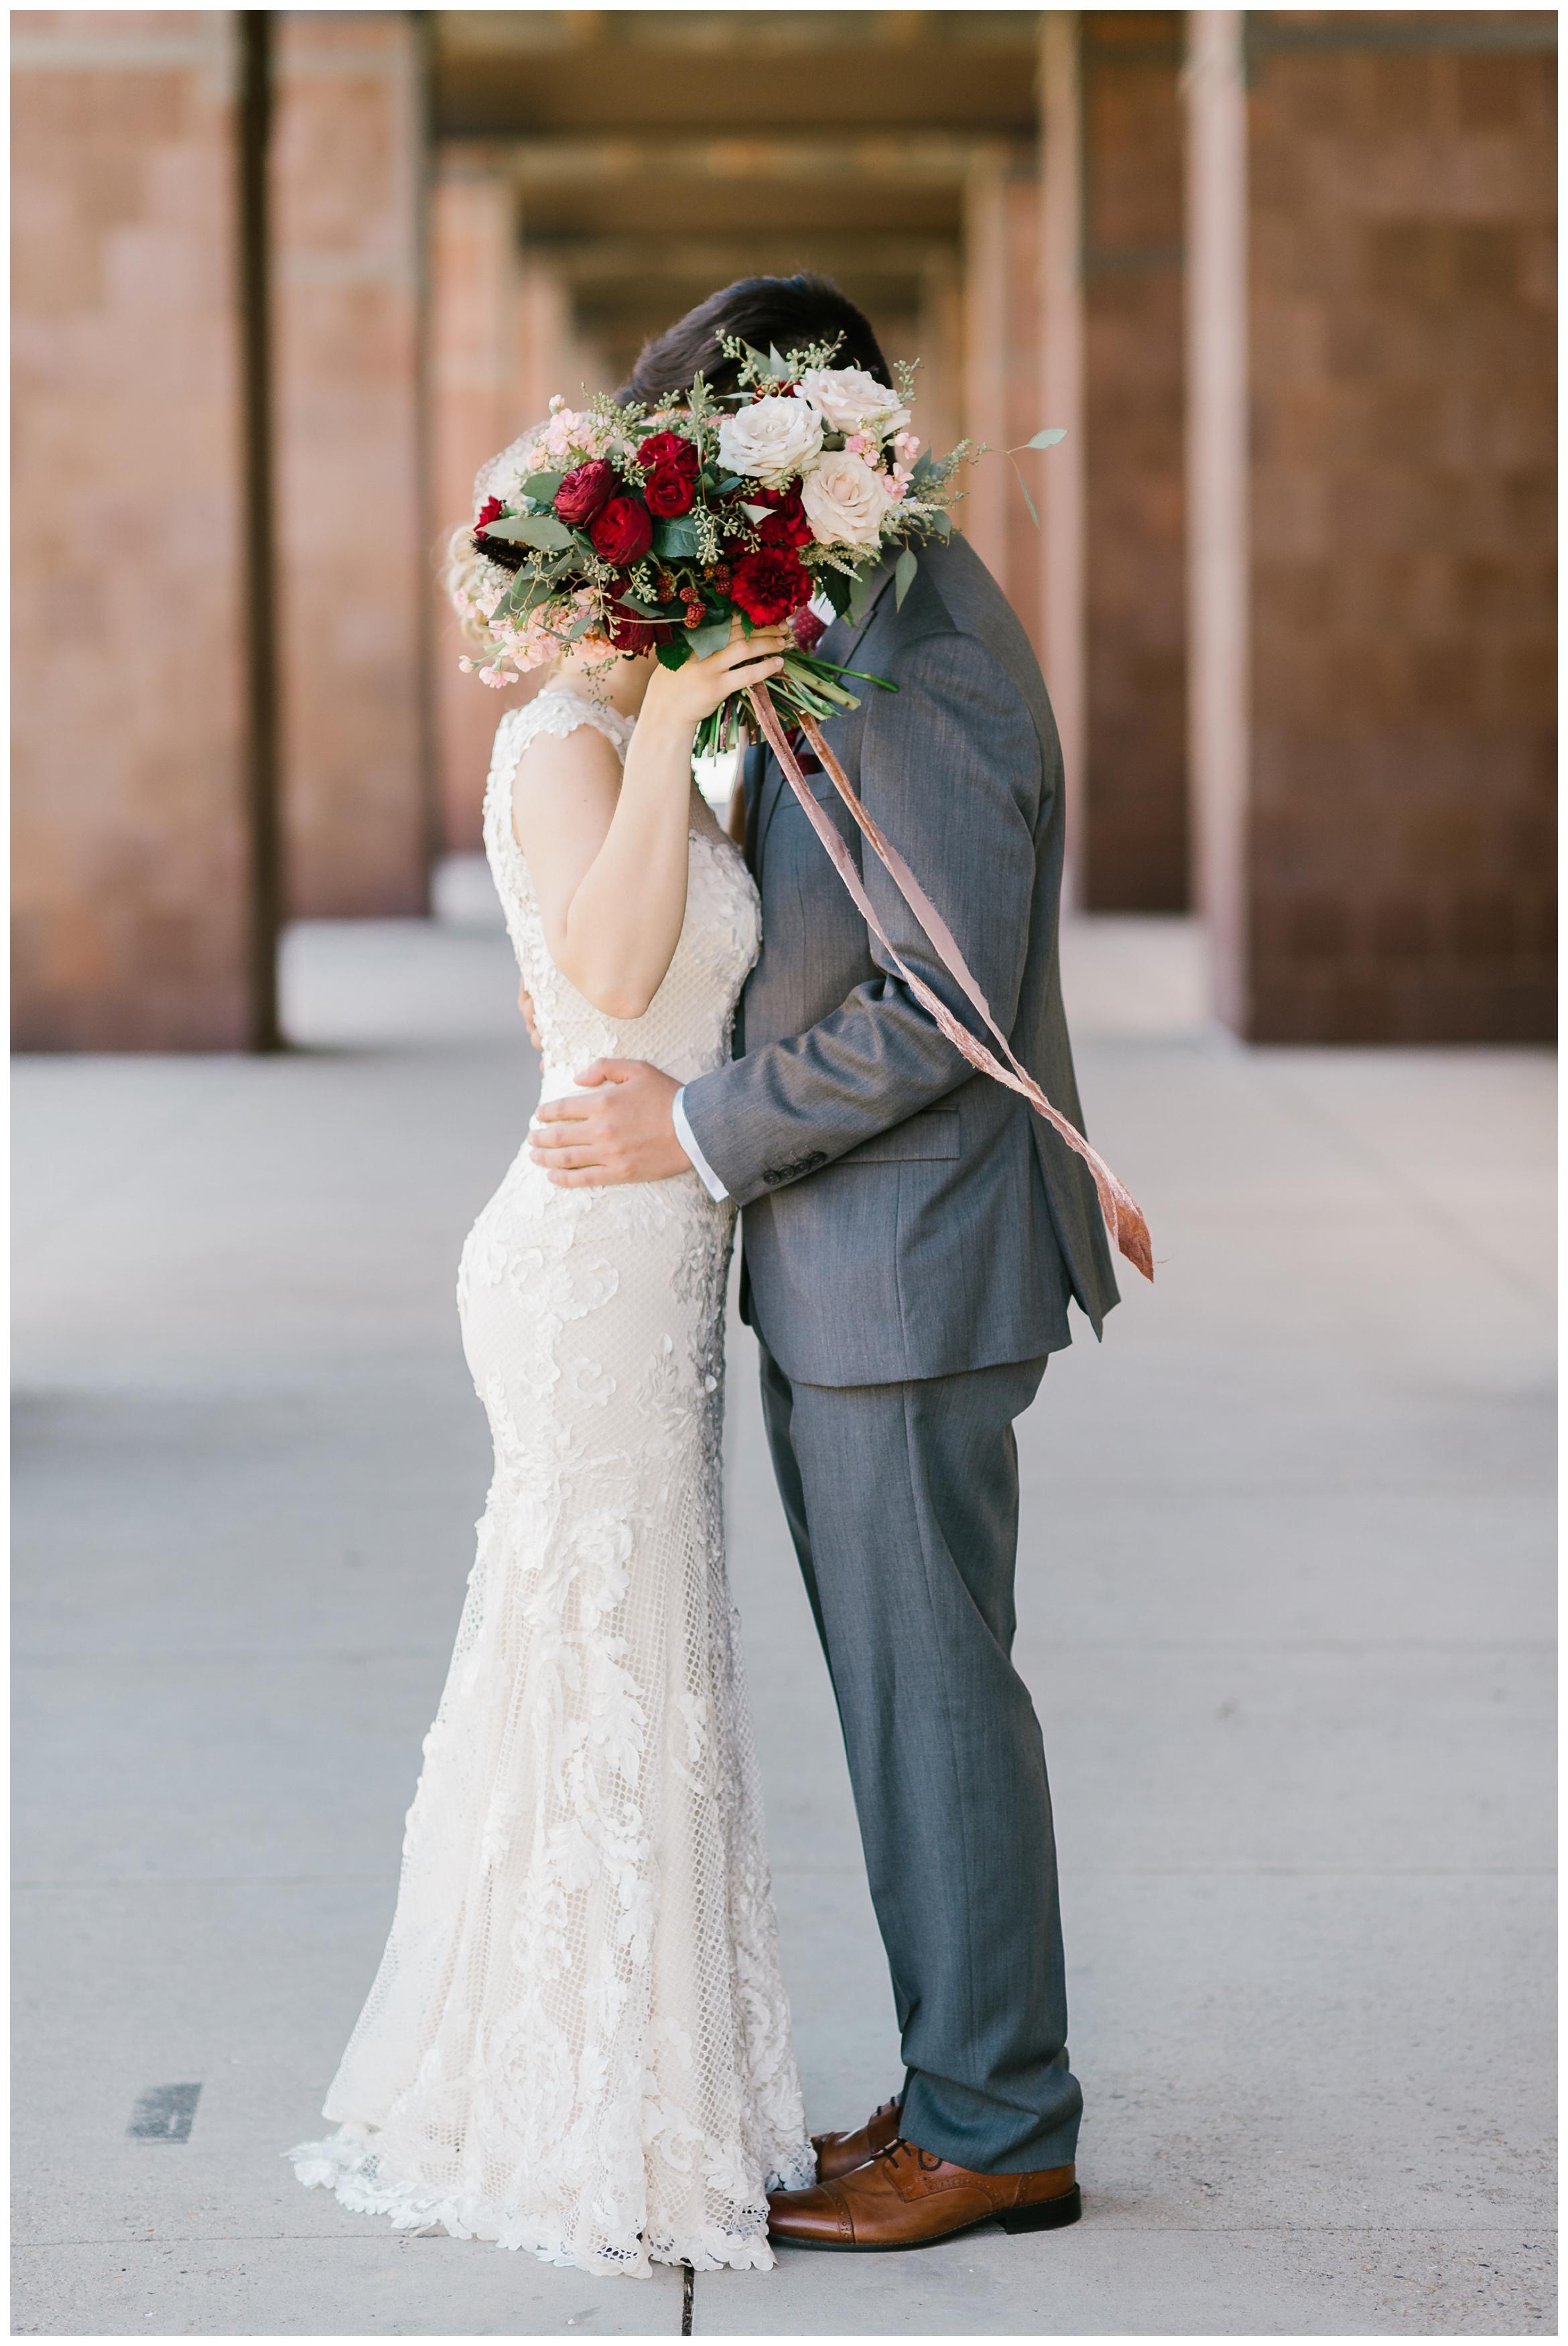 Rebecca_Shehorn_Photography_Indianapolis_Wedding_Photographer_7341.jpg